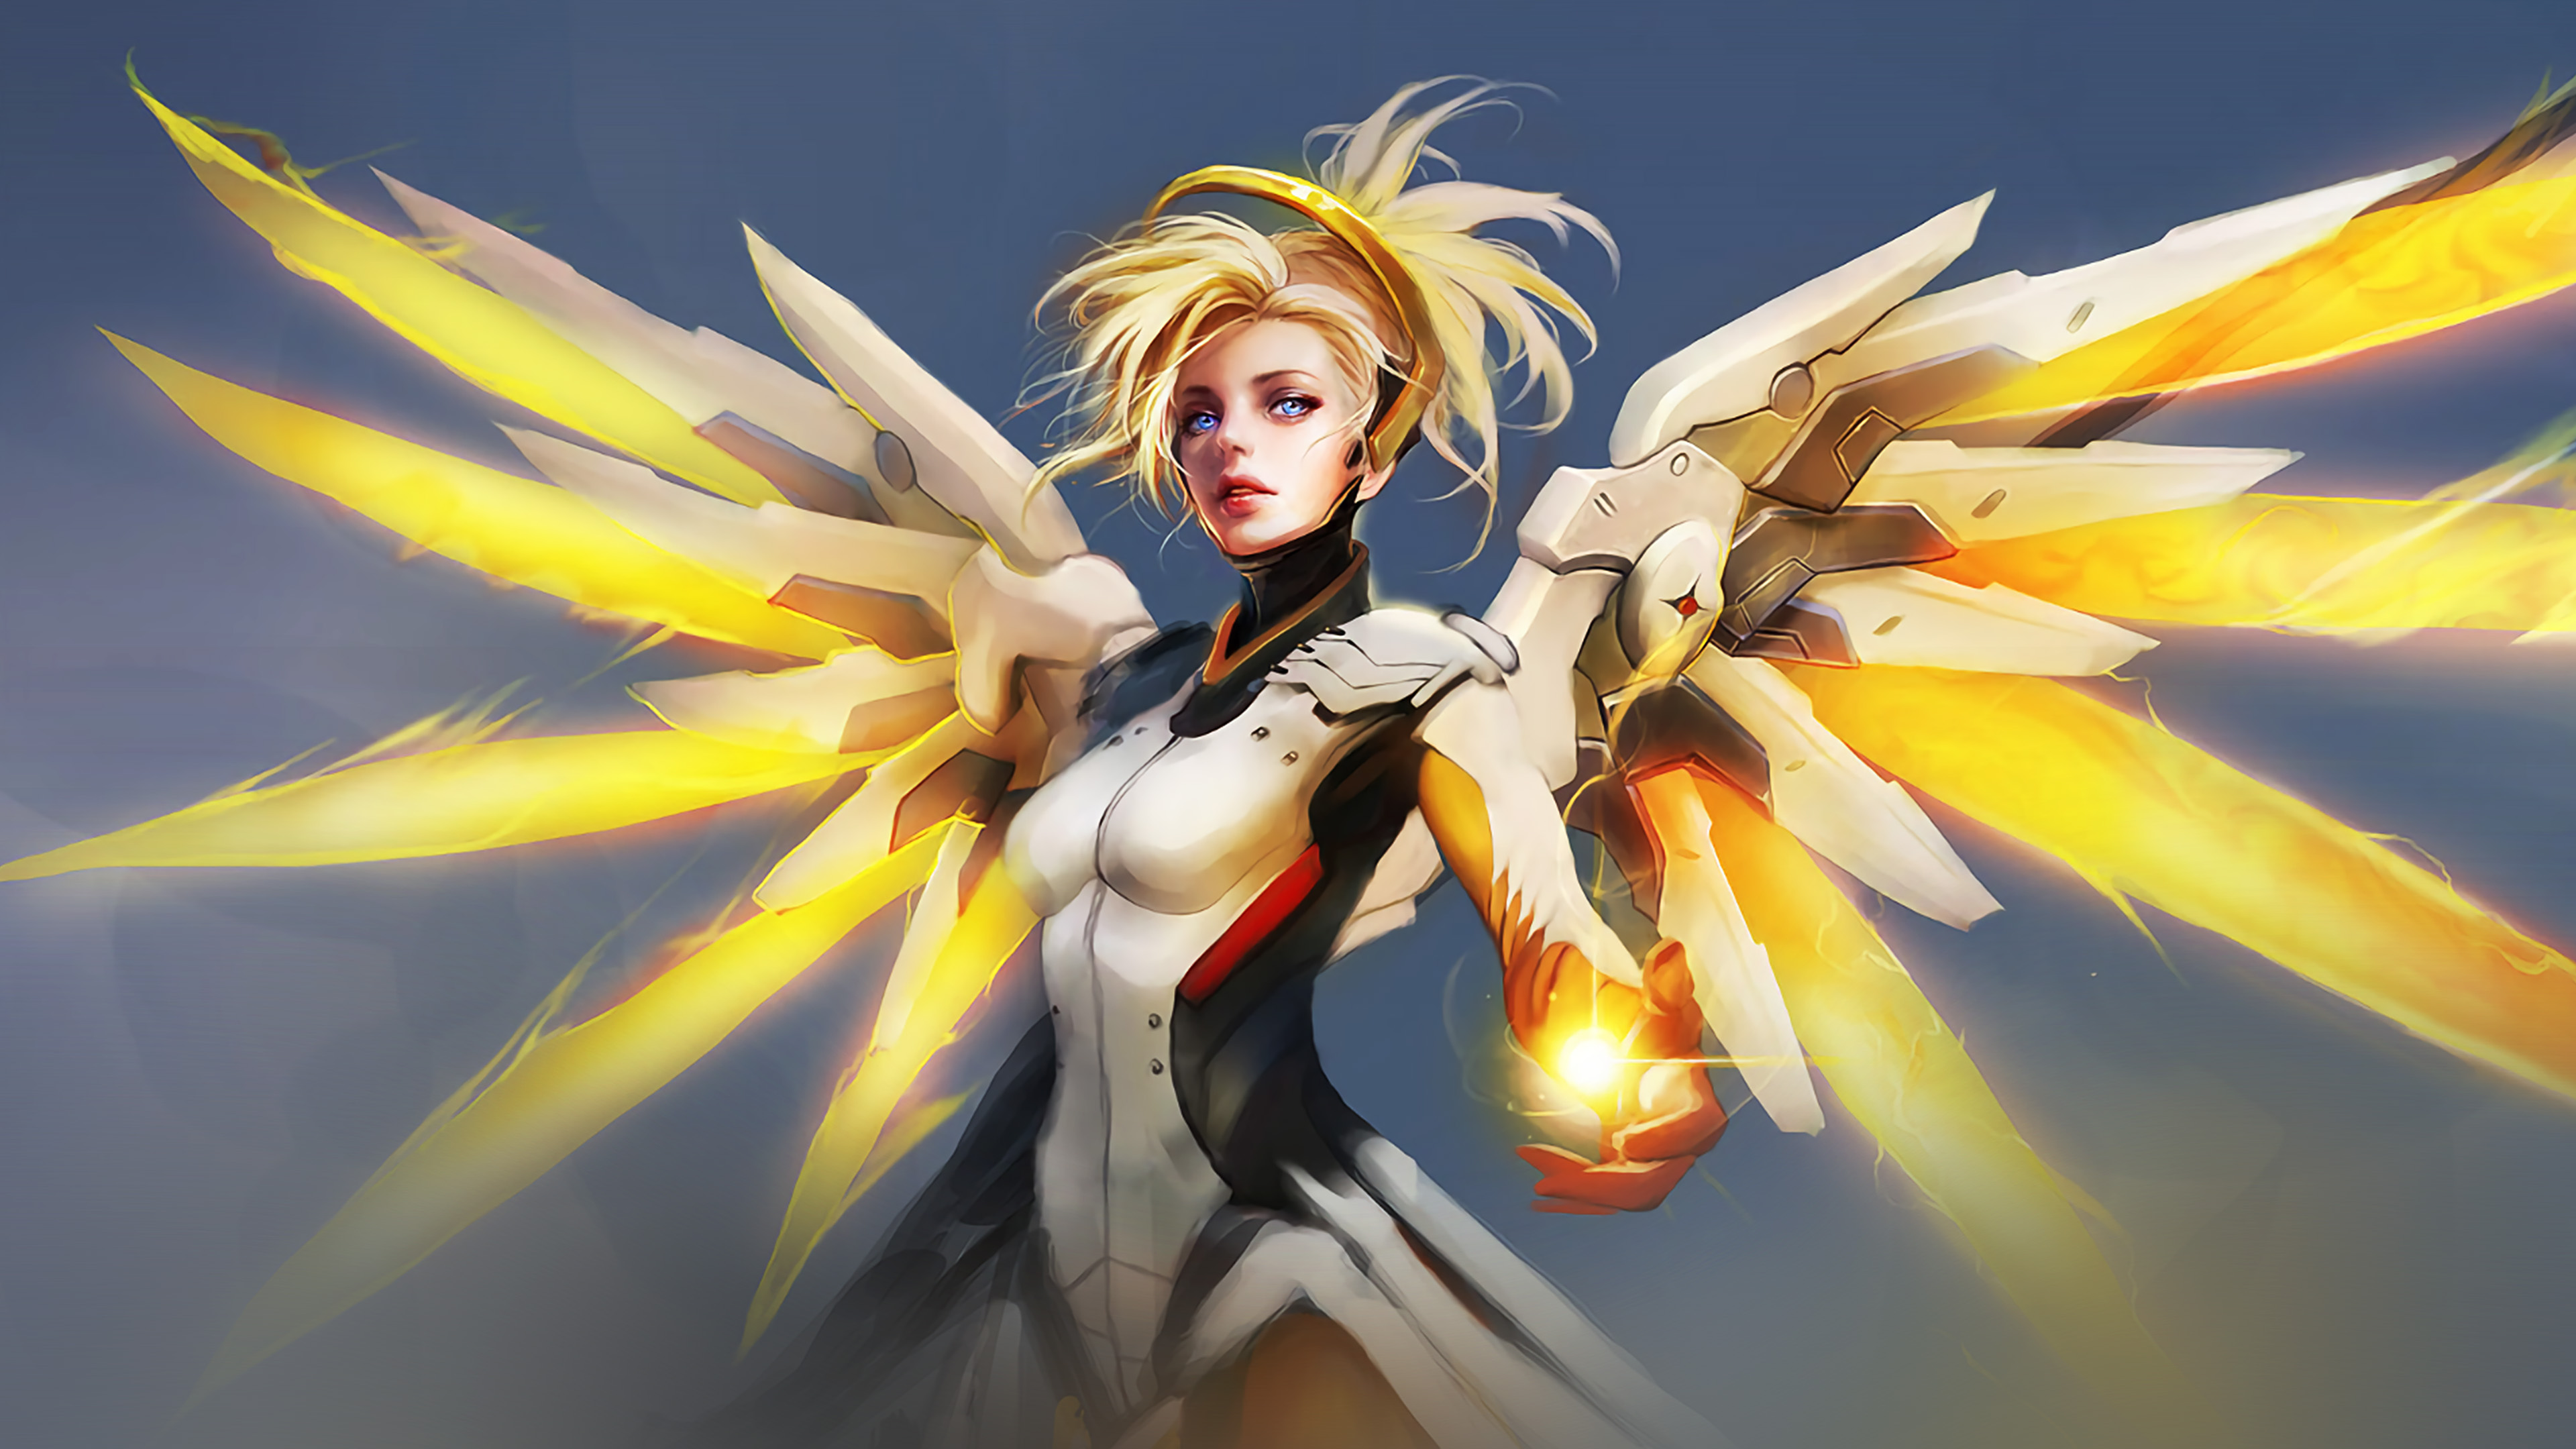 As01 Overwatch Mercy Cute Game Art Illustration Angel Wallpaper